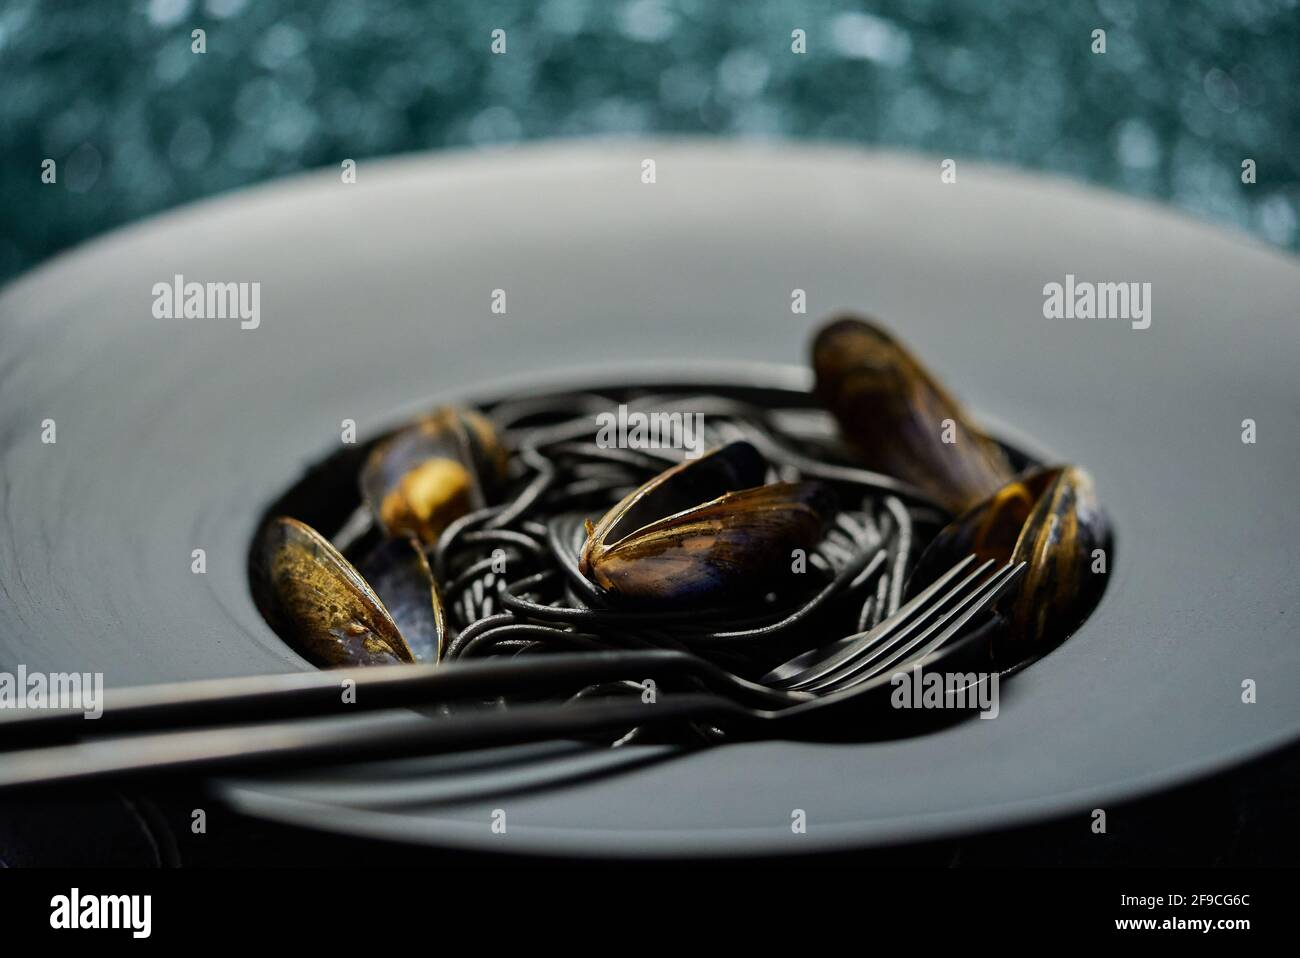 Seafood black spaghetti pasta with clams served on black plate on dark stone Stock Photo